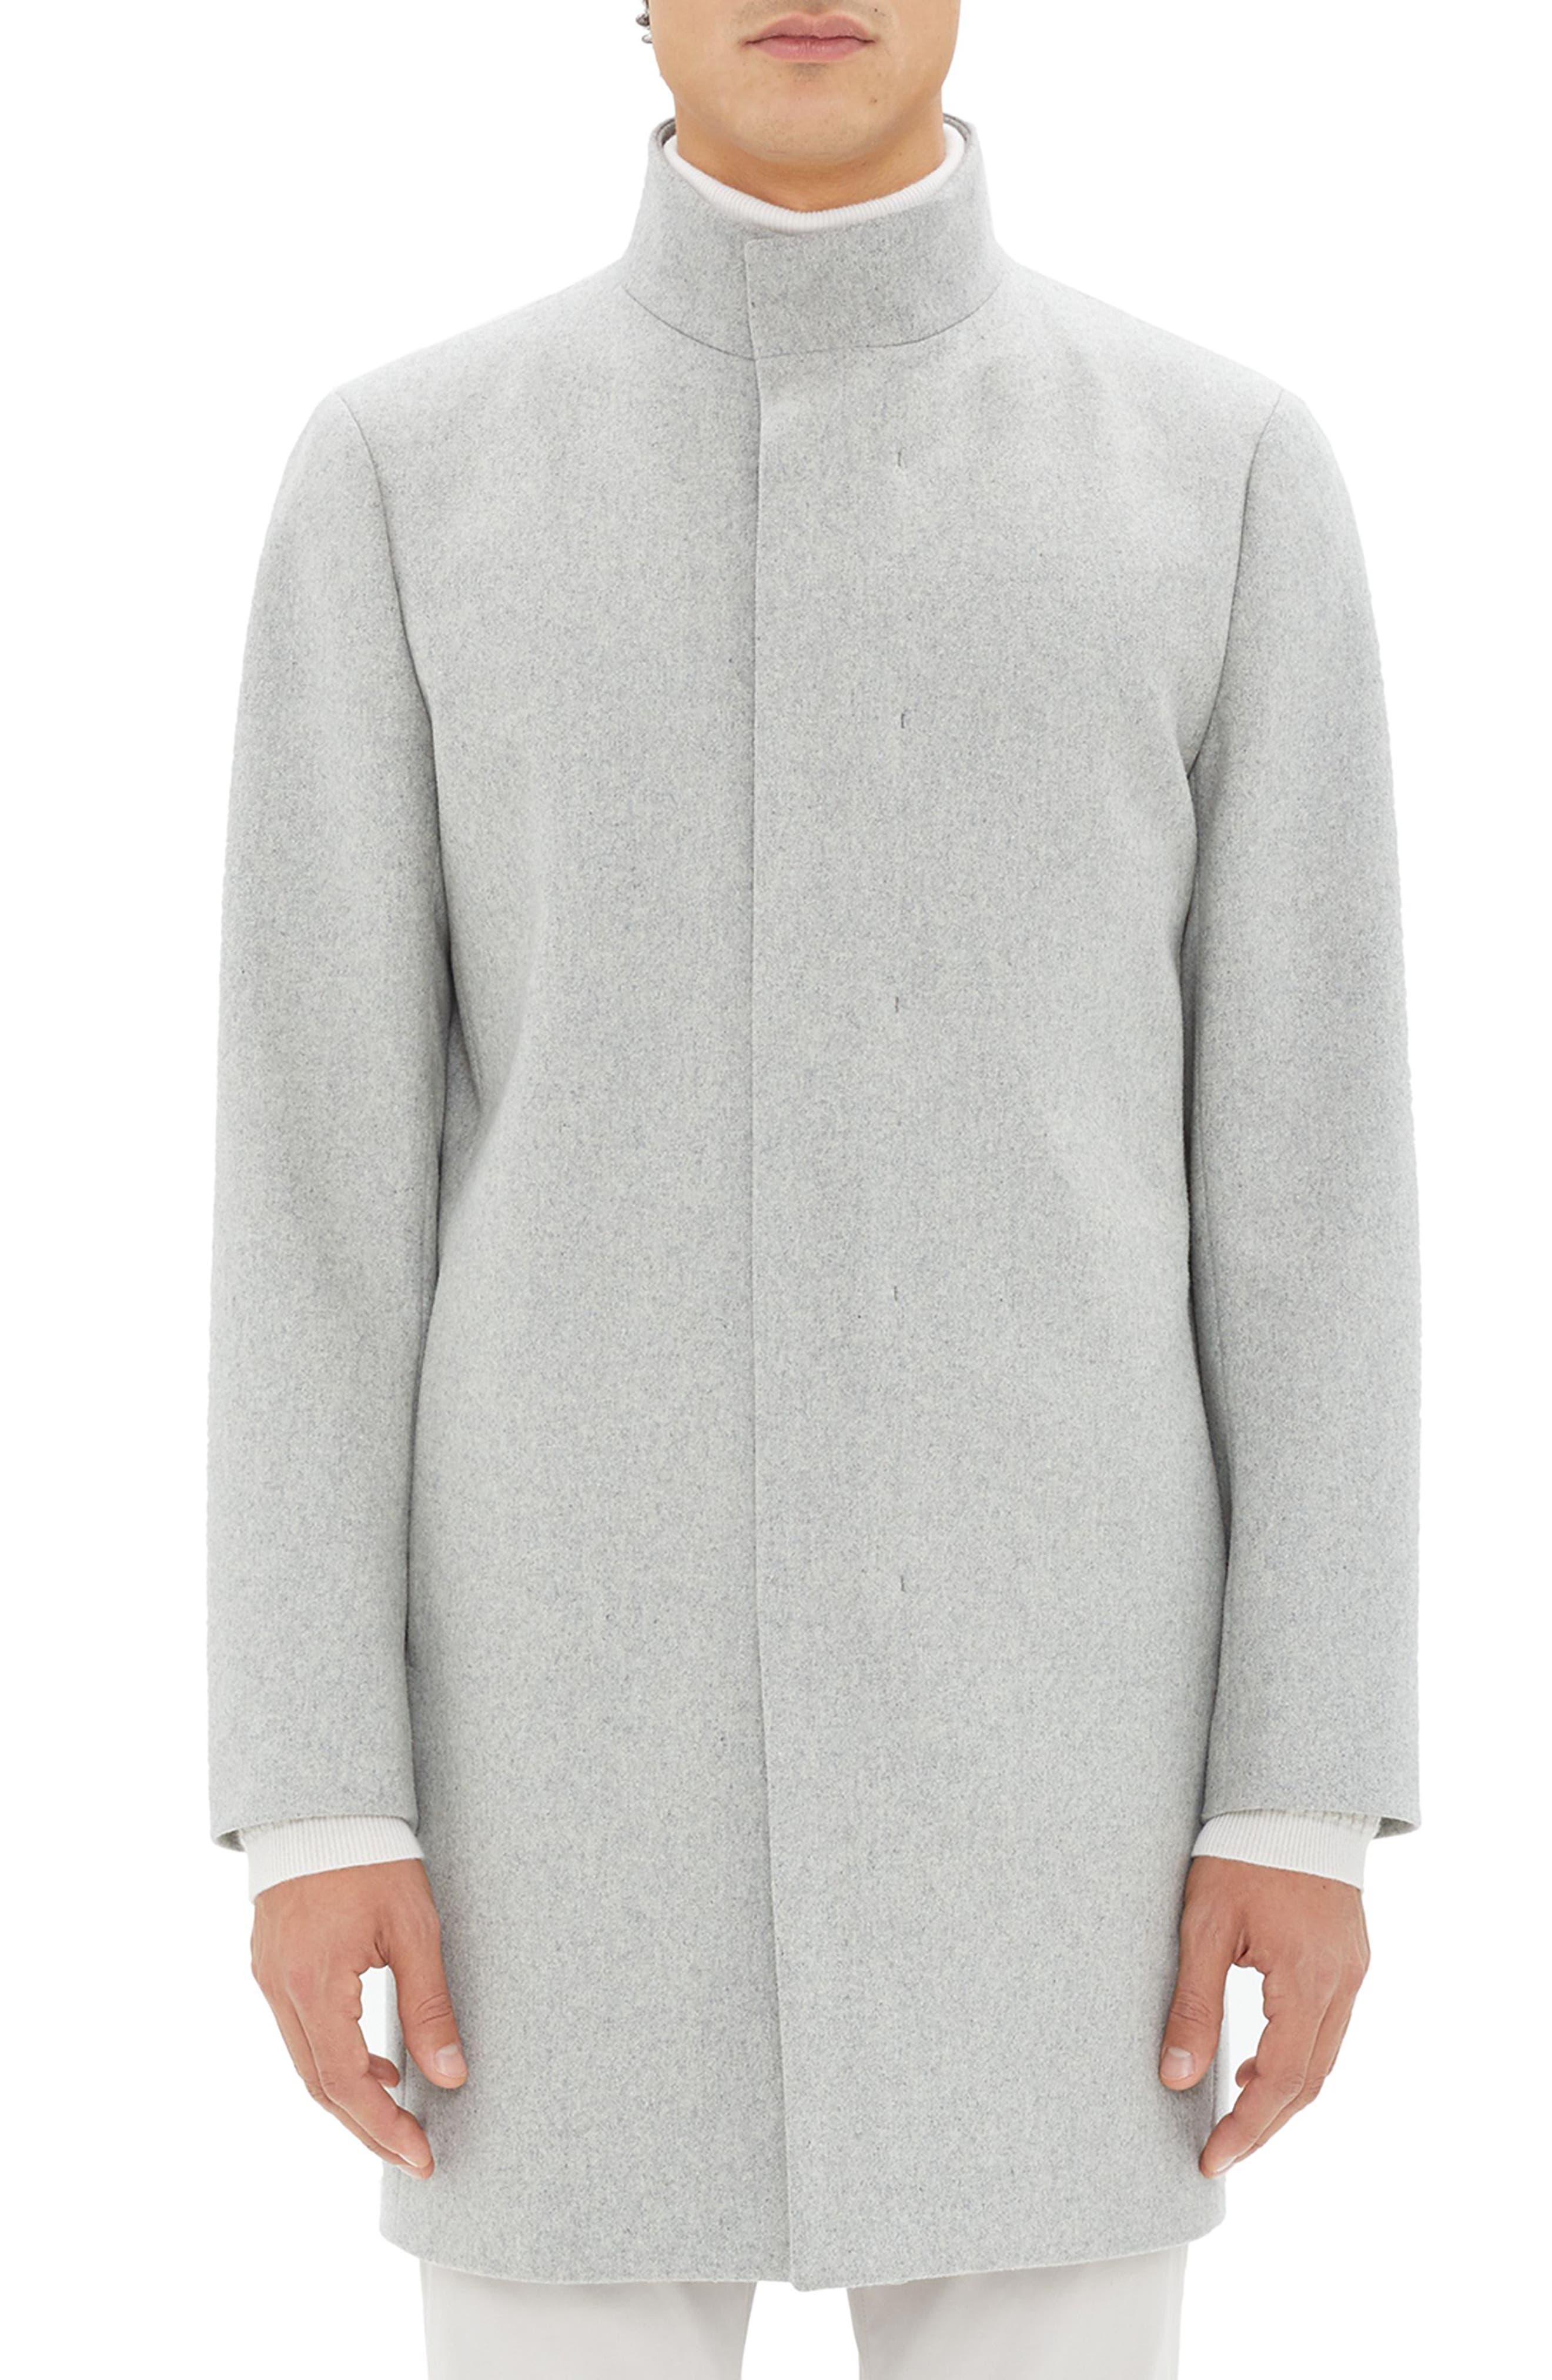 Belvin Modus Melton Wool Blend Coat,                             Main thumbnail 1, color,                             GREY MELANGE